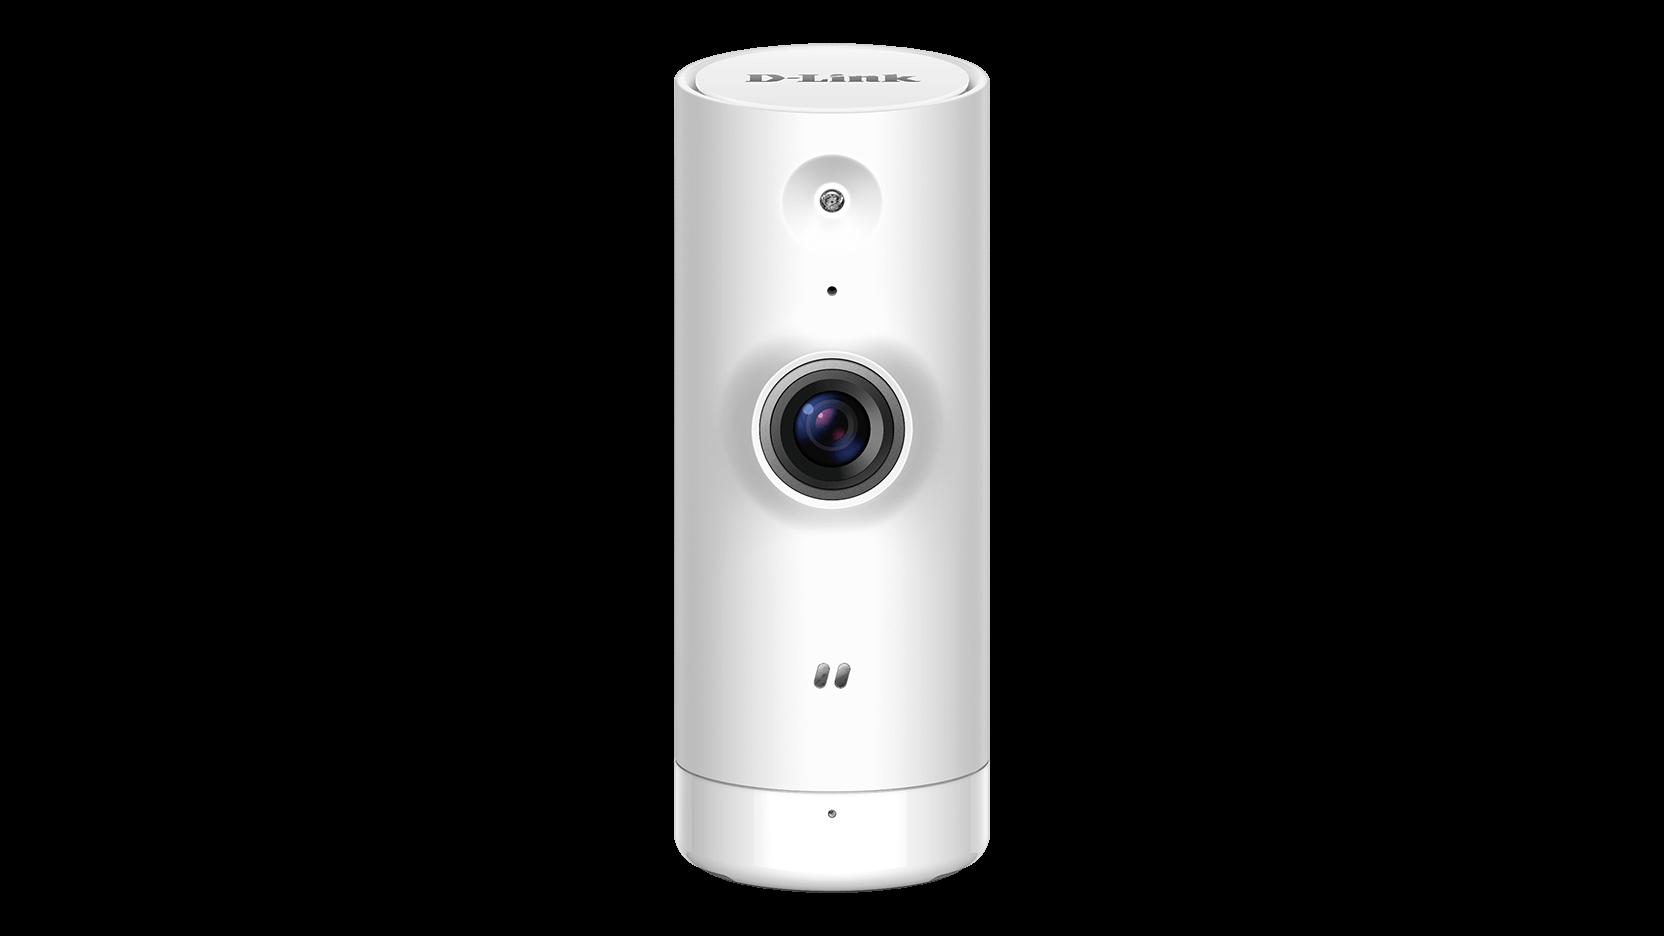 Dcs 8000lh Mini Hd Wifi Camera D Link Uk